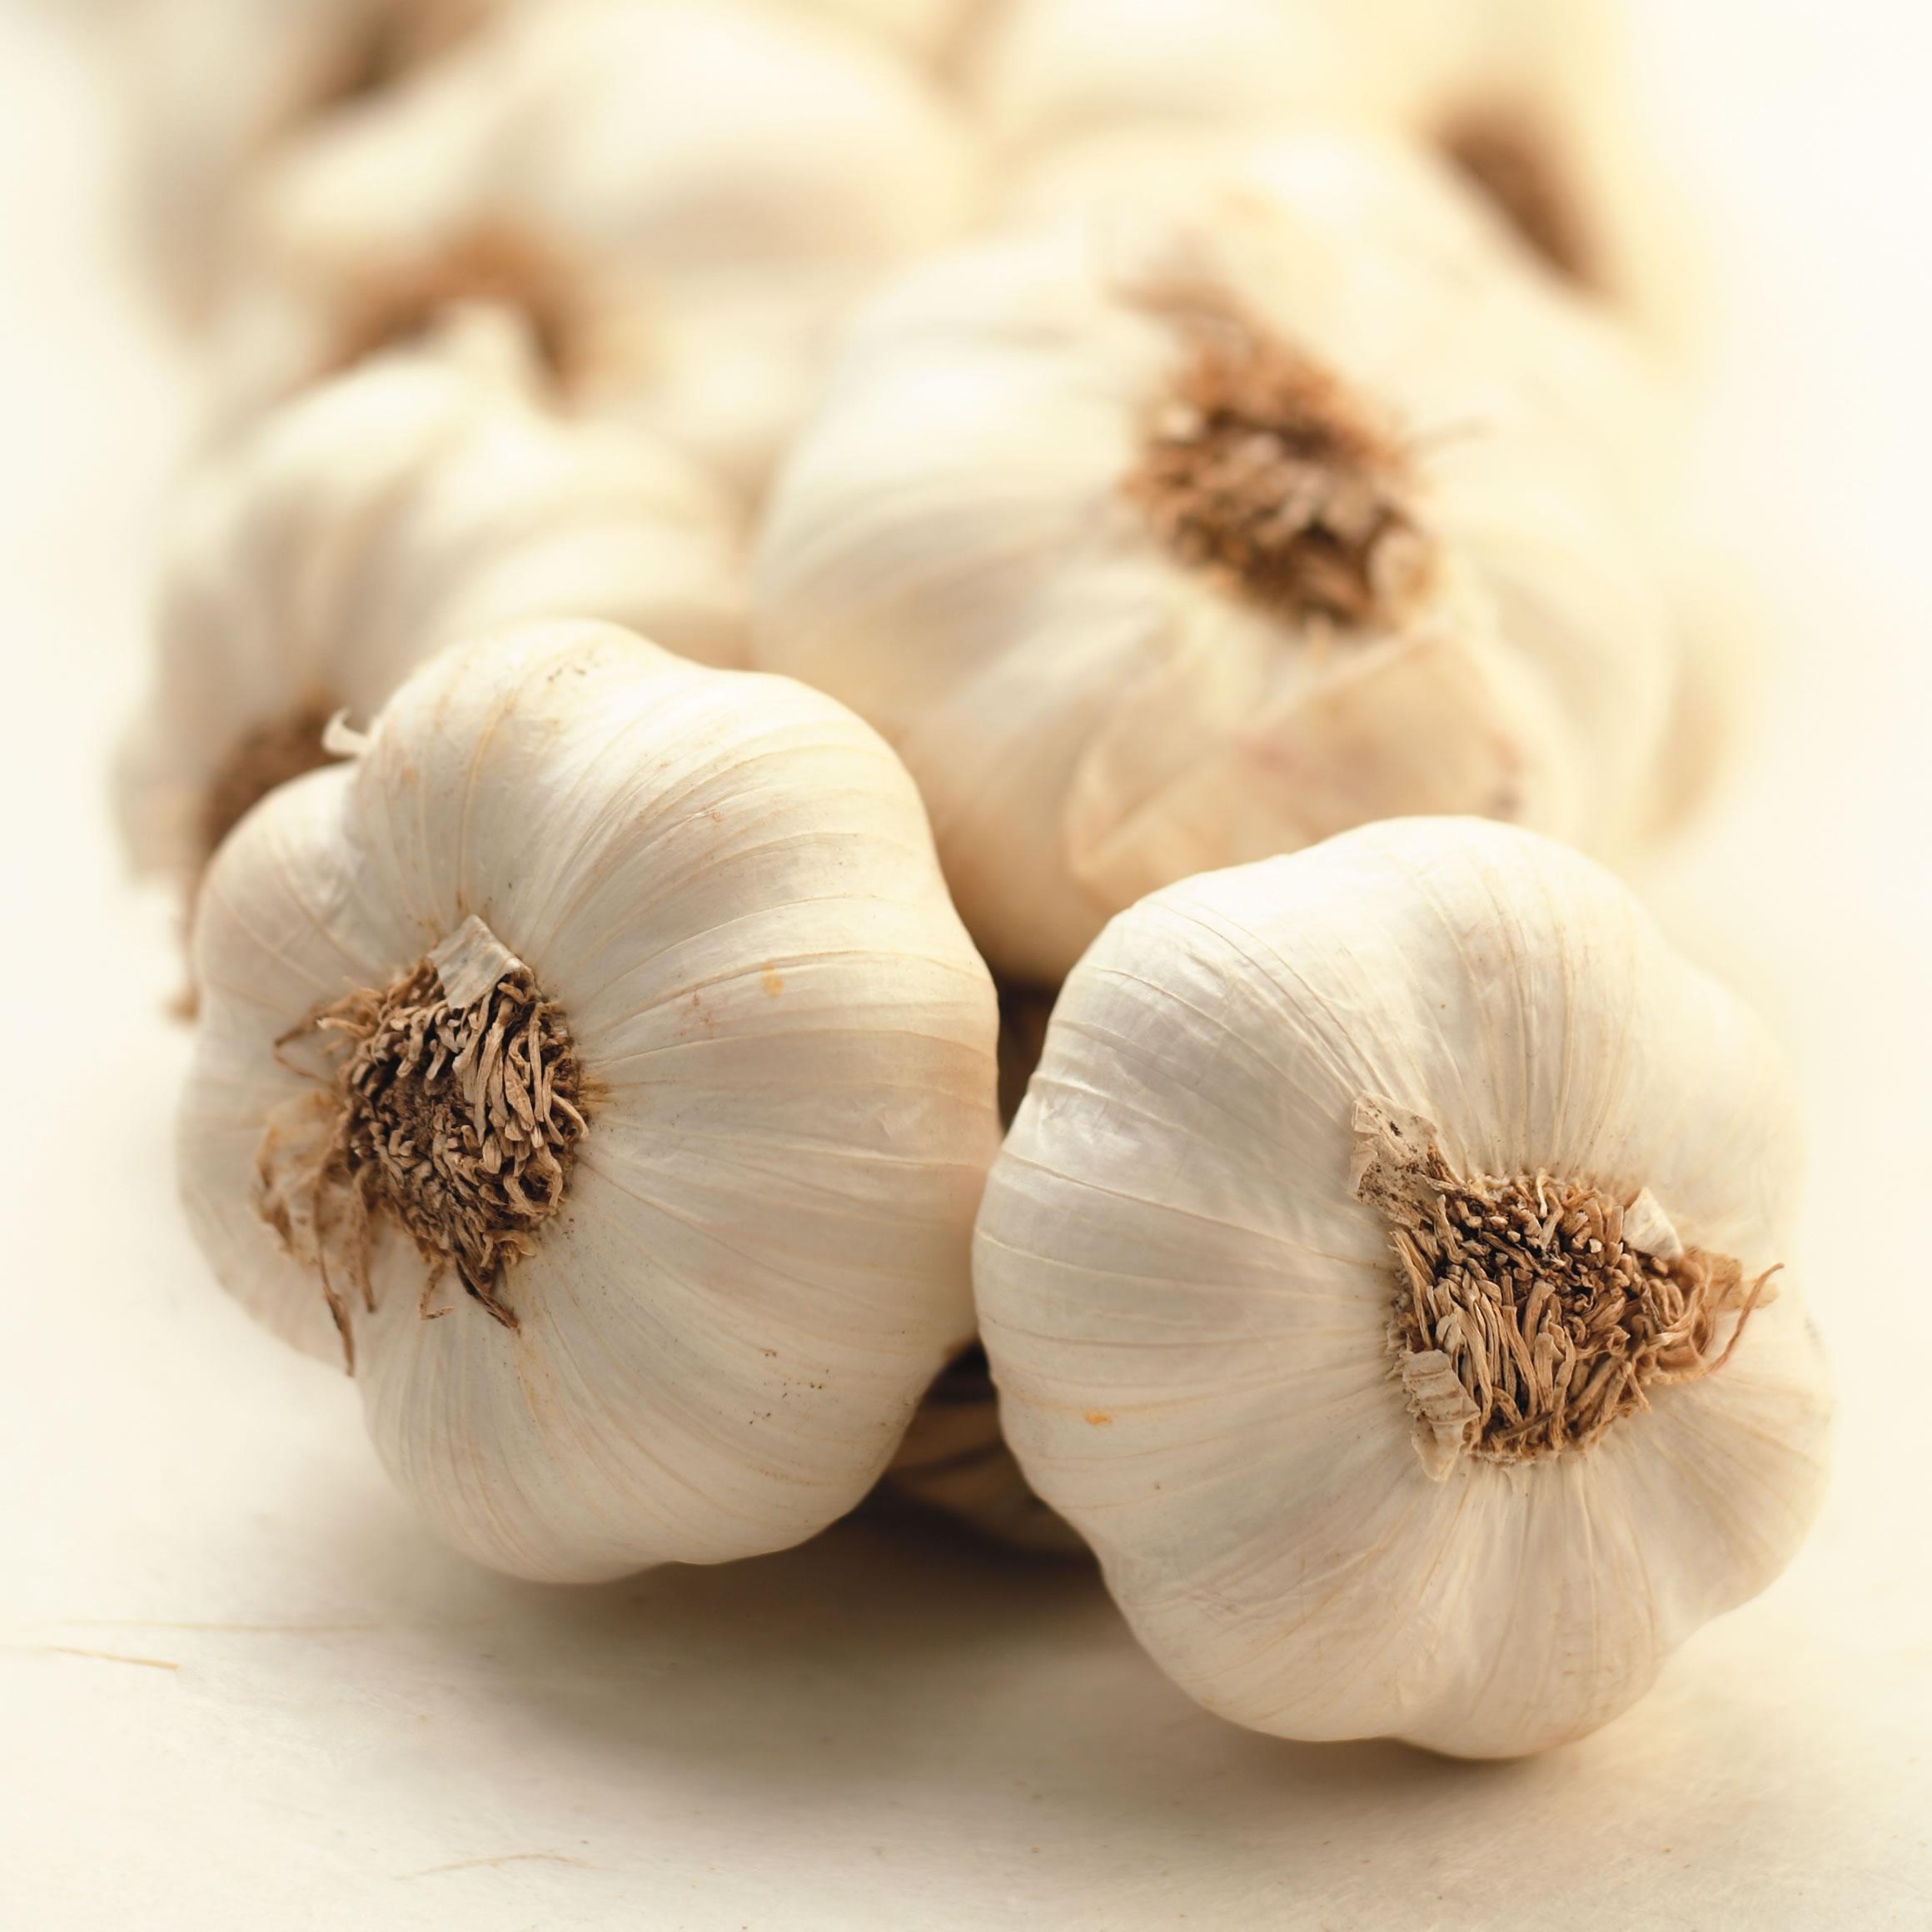 garlic 310 0